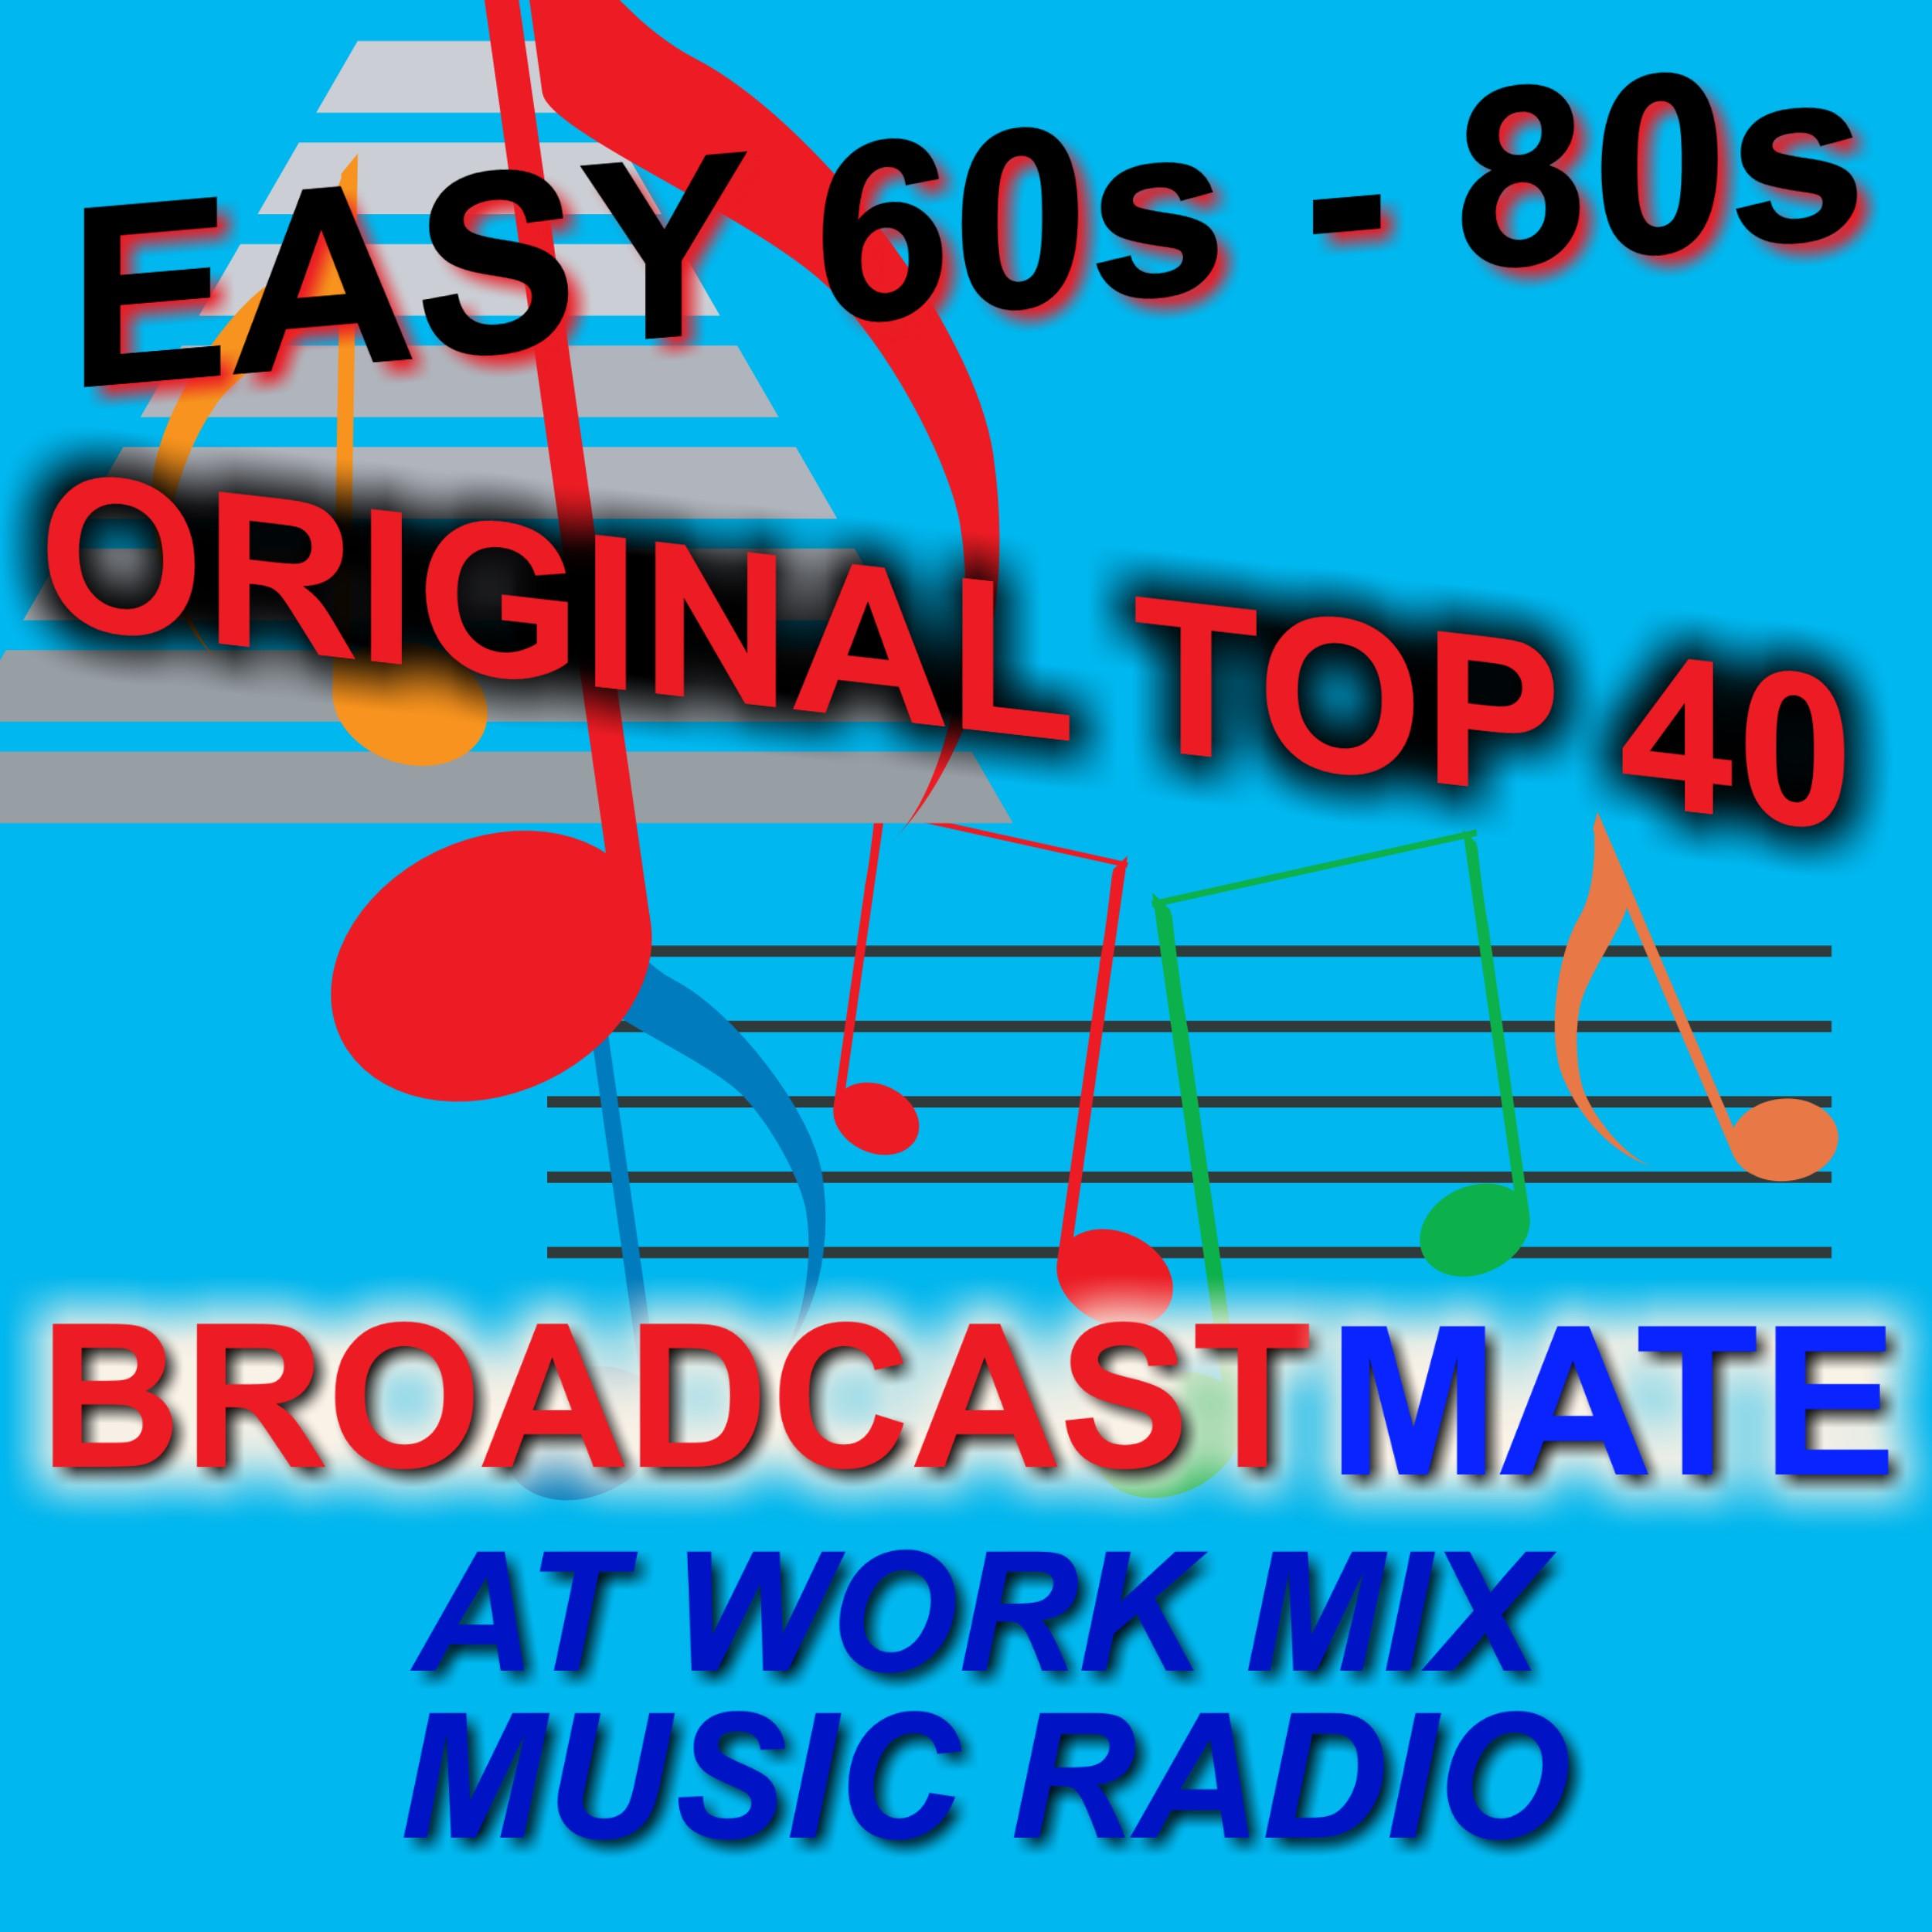 BROADCASTMATE MUSIC RADIO 60S TO 80S POP logo